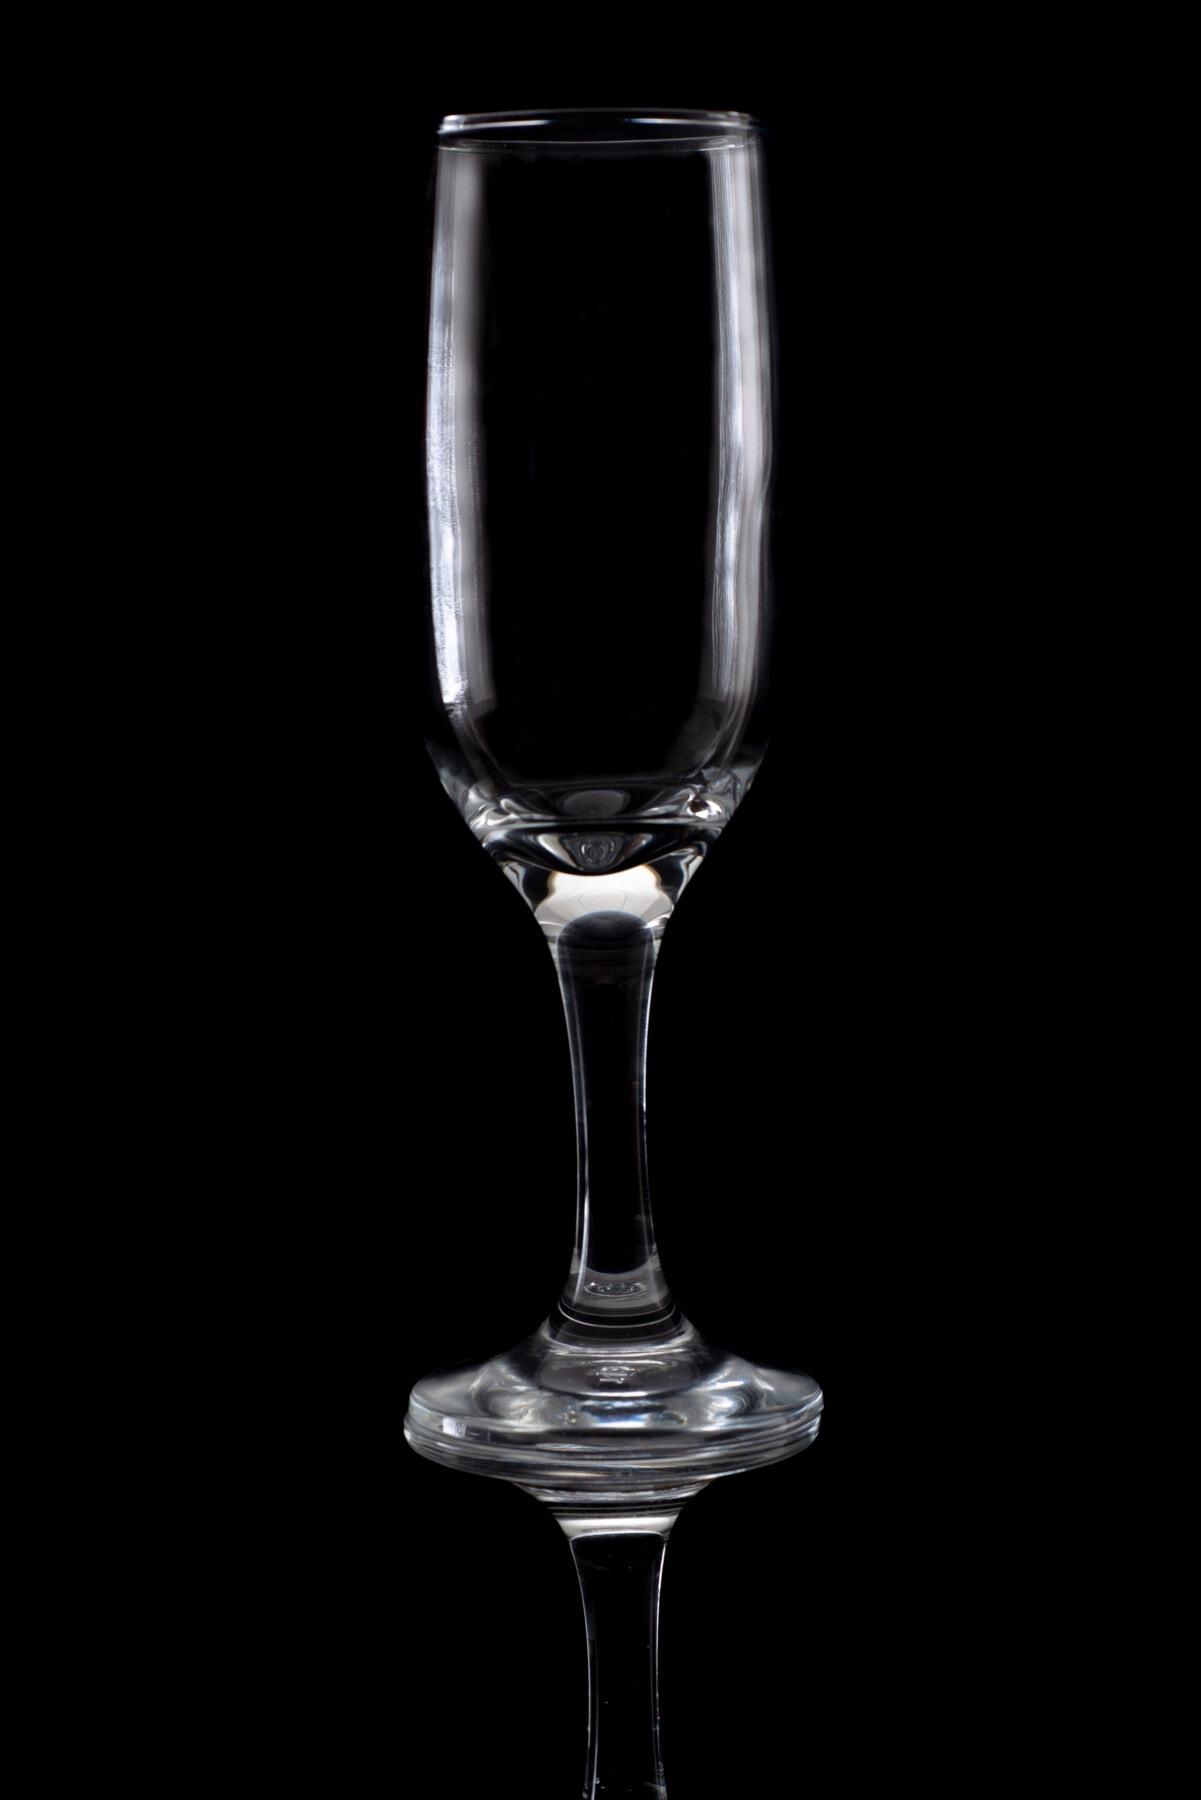 glass, crystal, photo studio, photograph, dark, transparent, reflection, empty, close-up, elegant